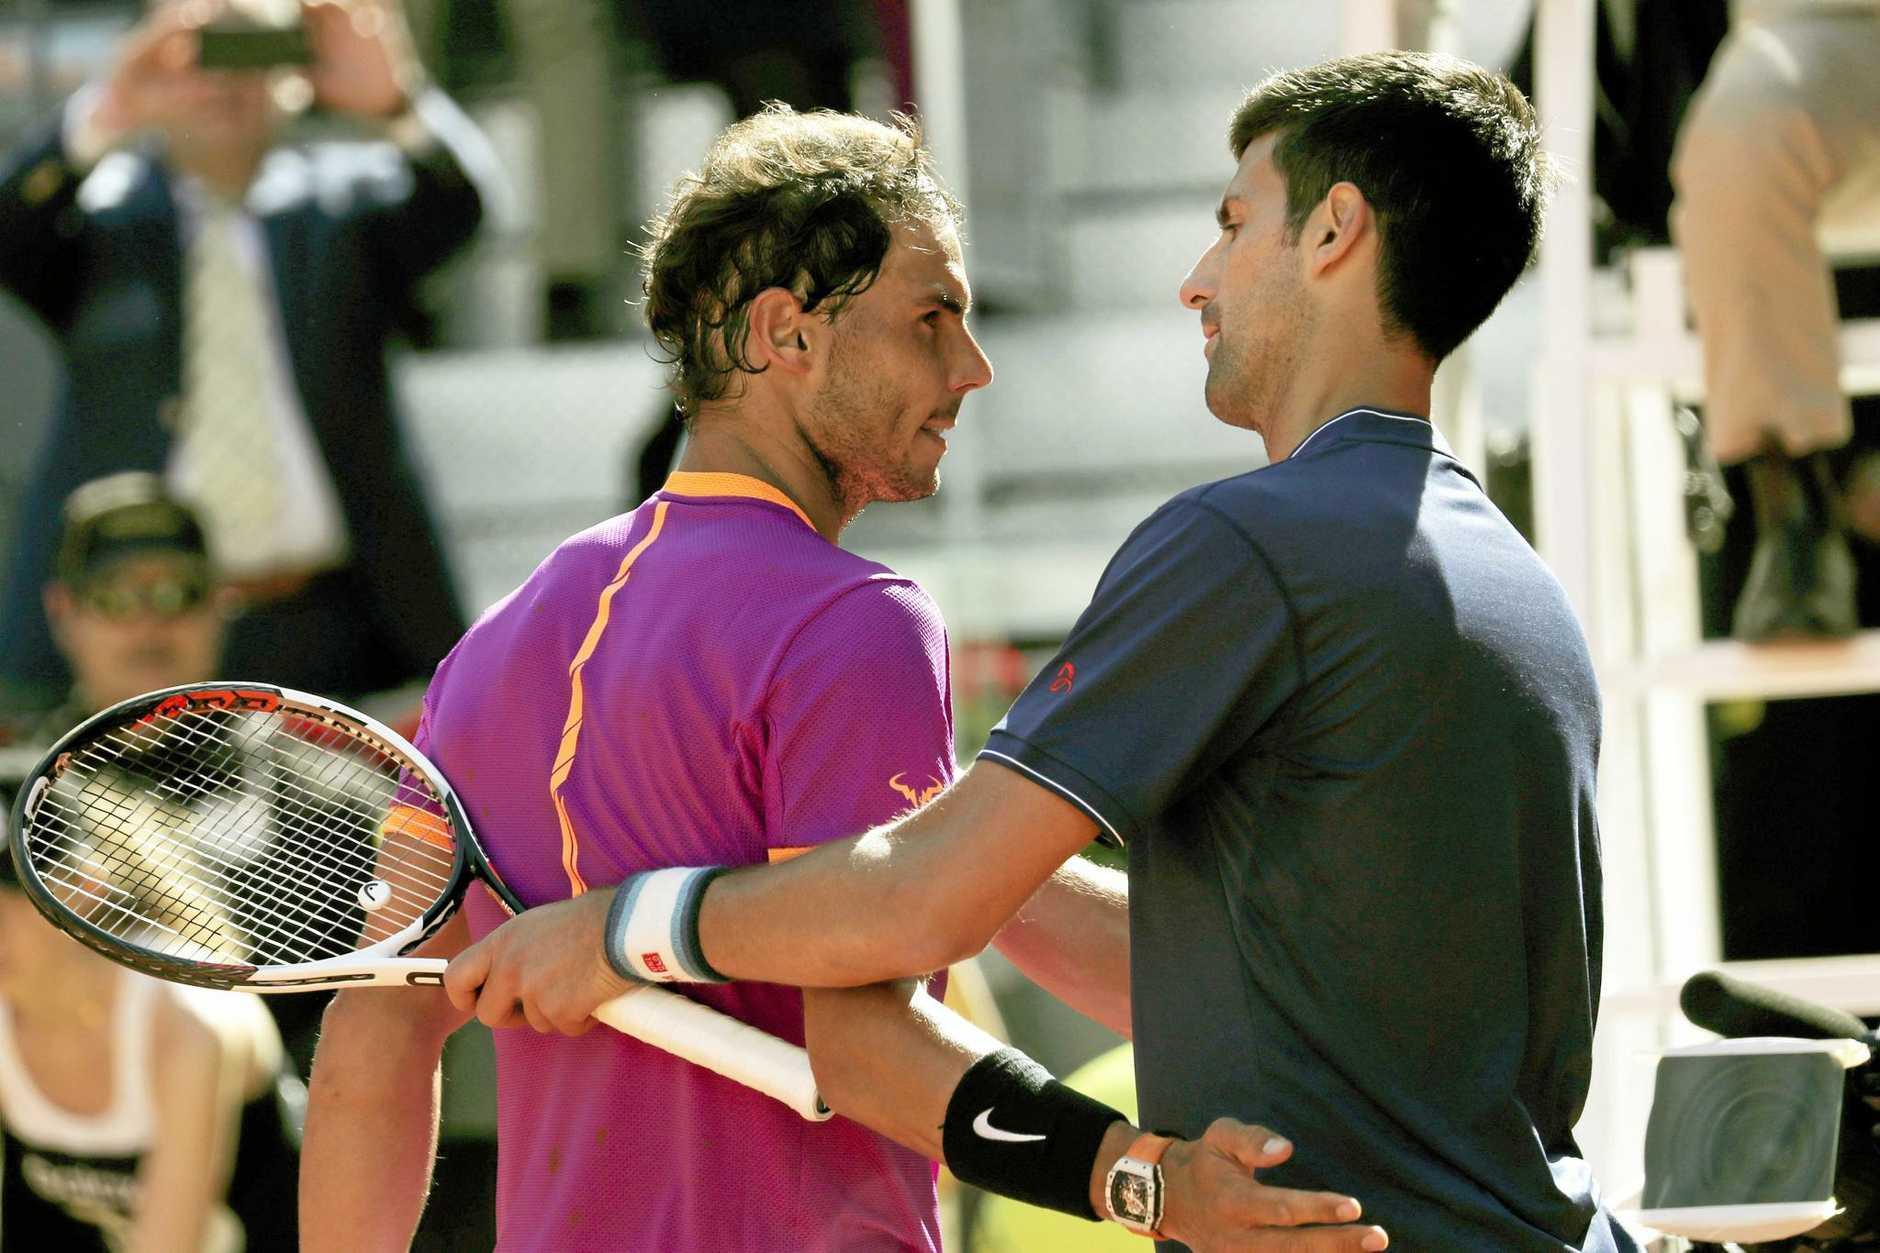 Spain's Rafael Nadal (left) after winning his semi-final match against Serbia's Novak Djokovic at the Madrid Open.